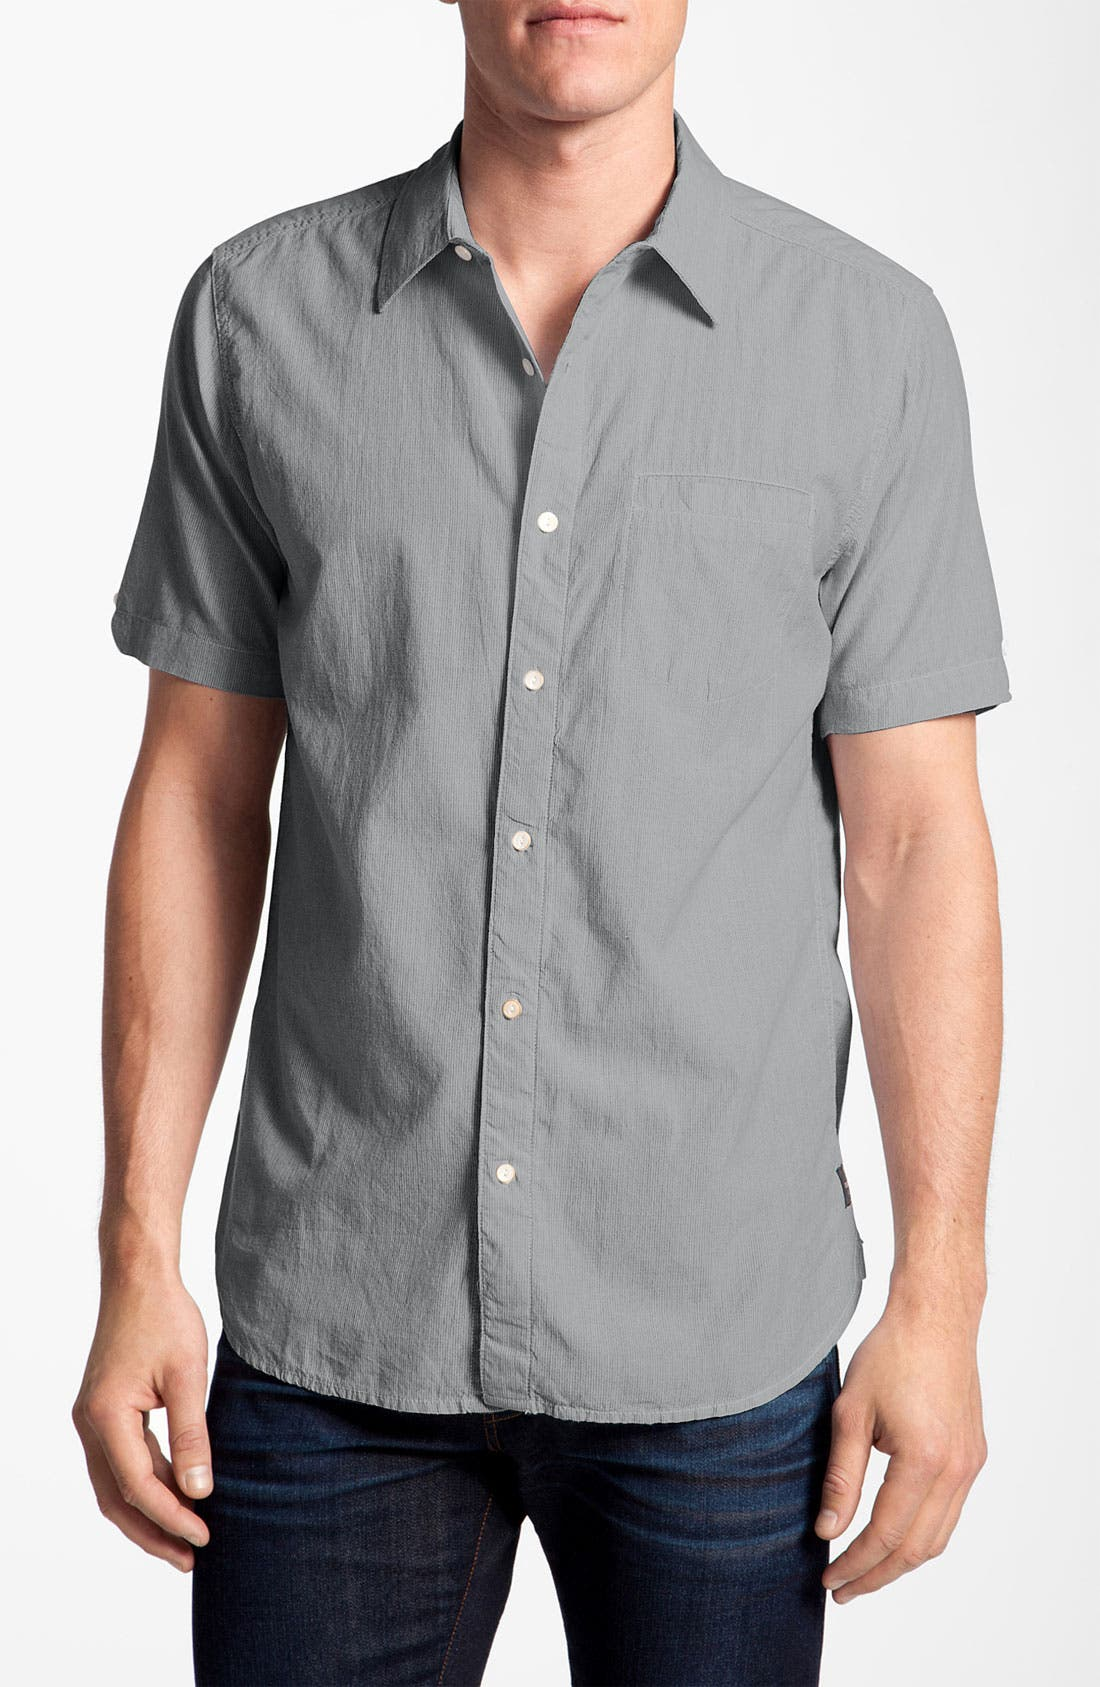 Alternate Image 1 Selected - Quiksilver 'Nooksie Neu' Woven Shirt